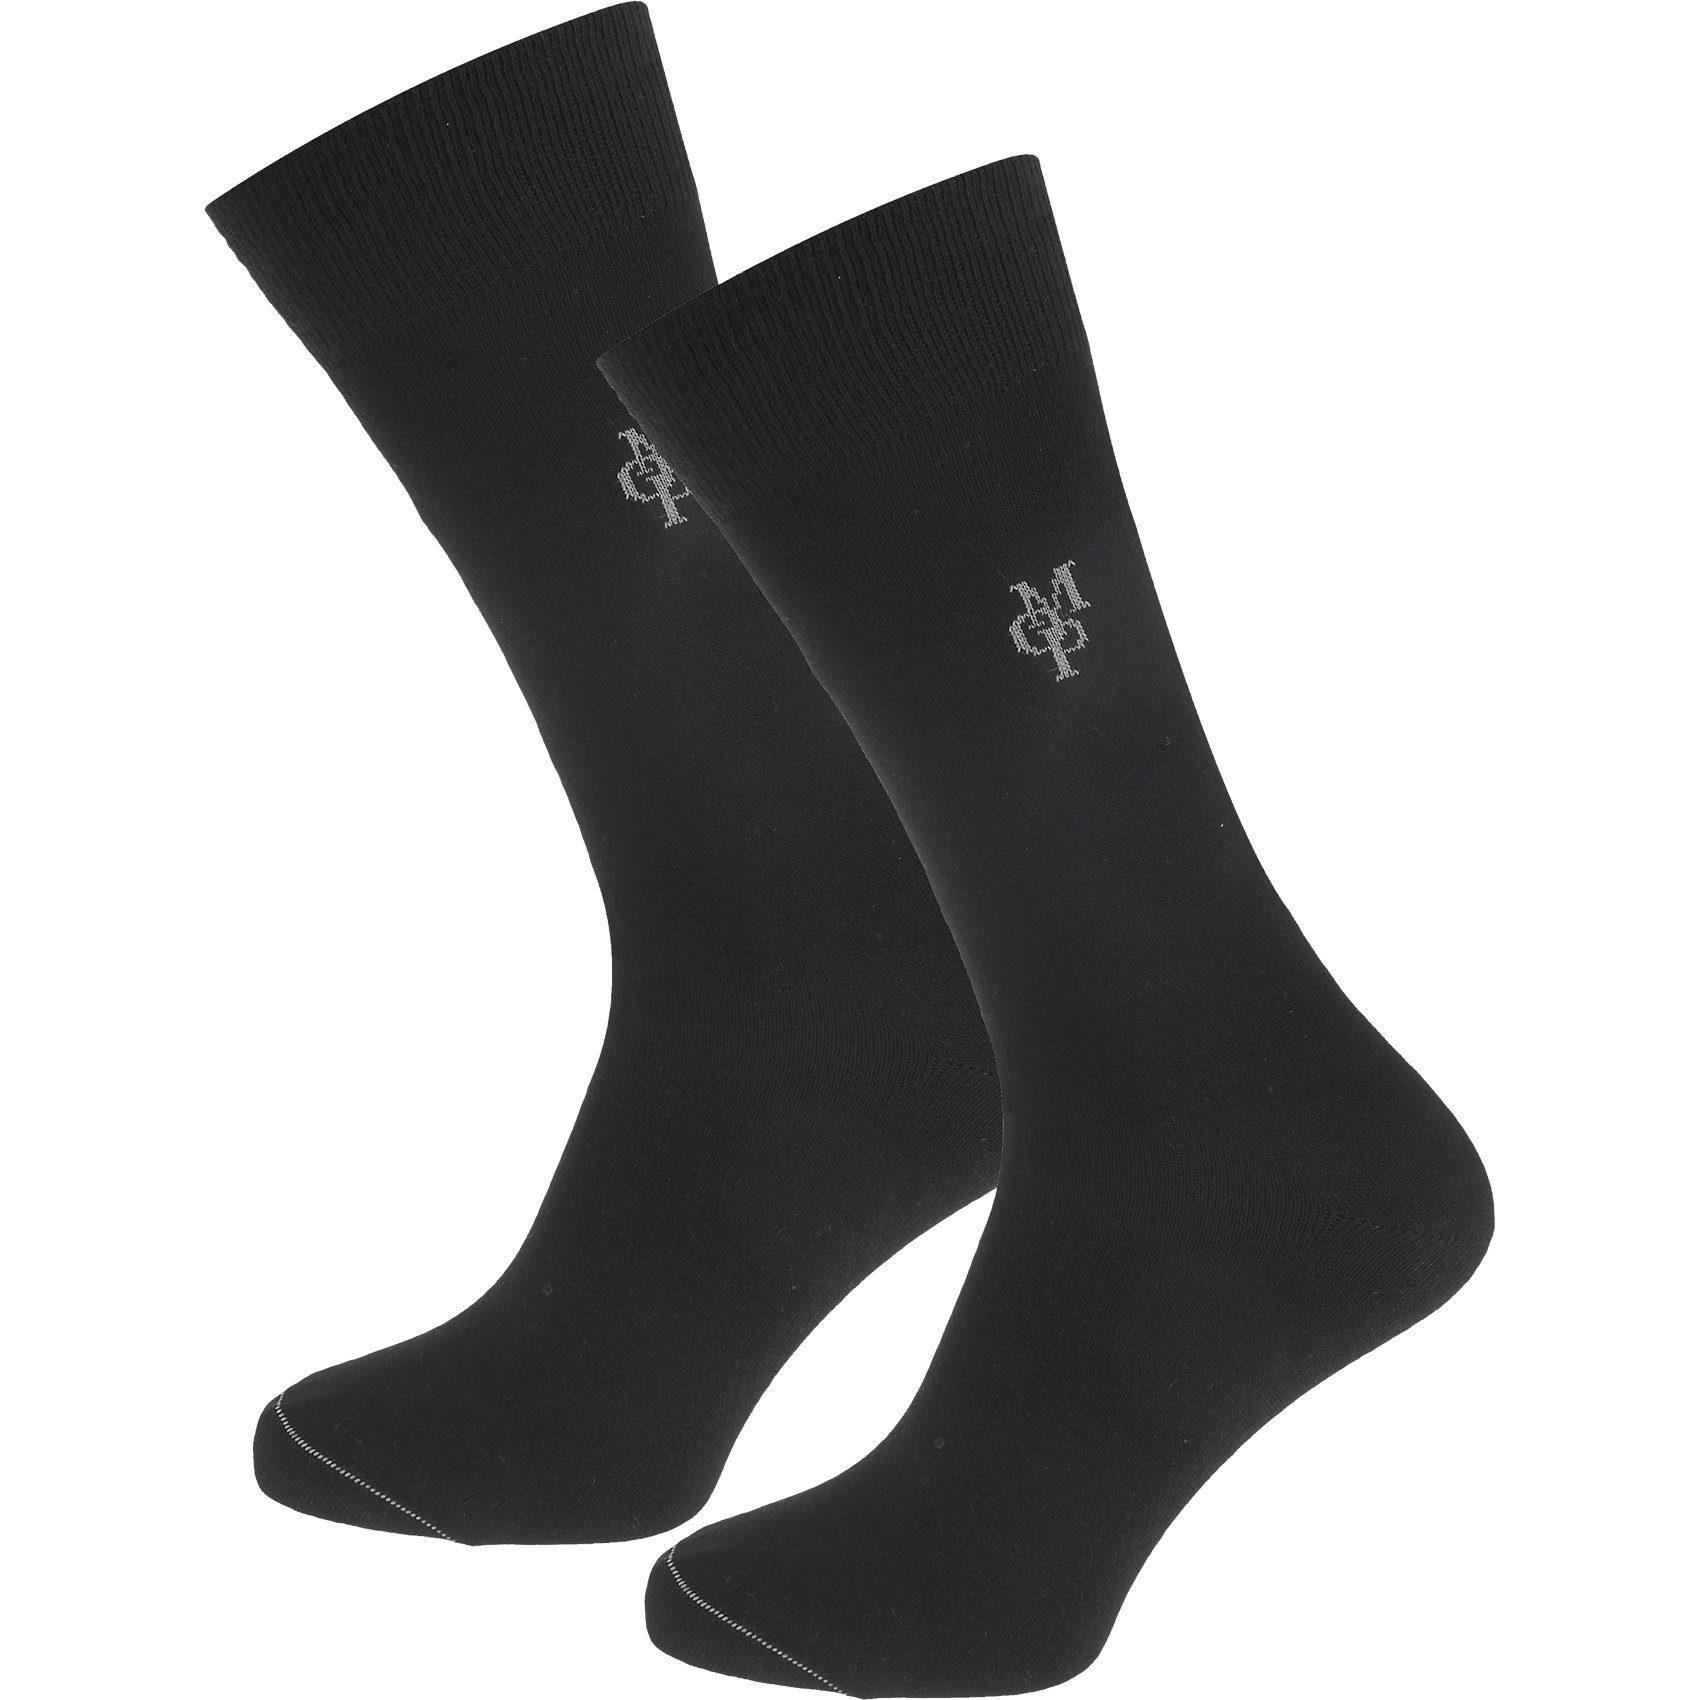 MARC O'POLO Larsen 2 Paar Socken online kaufen  schwarz